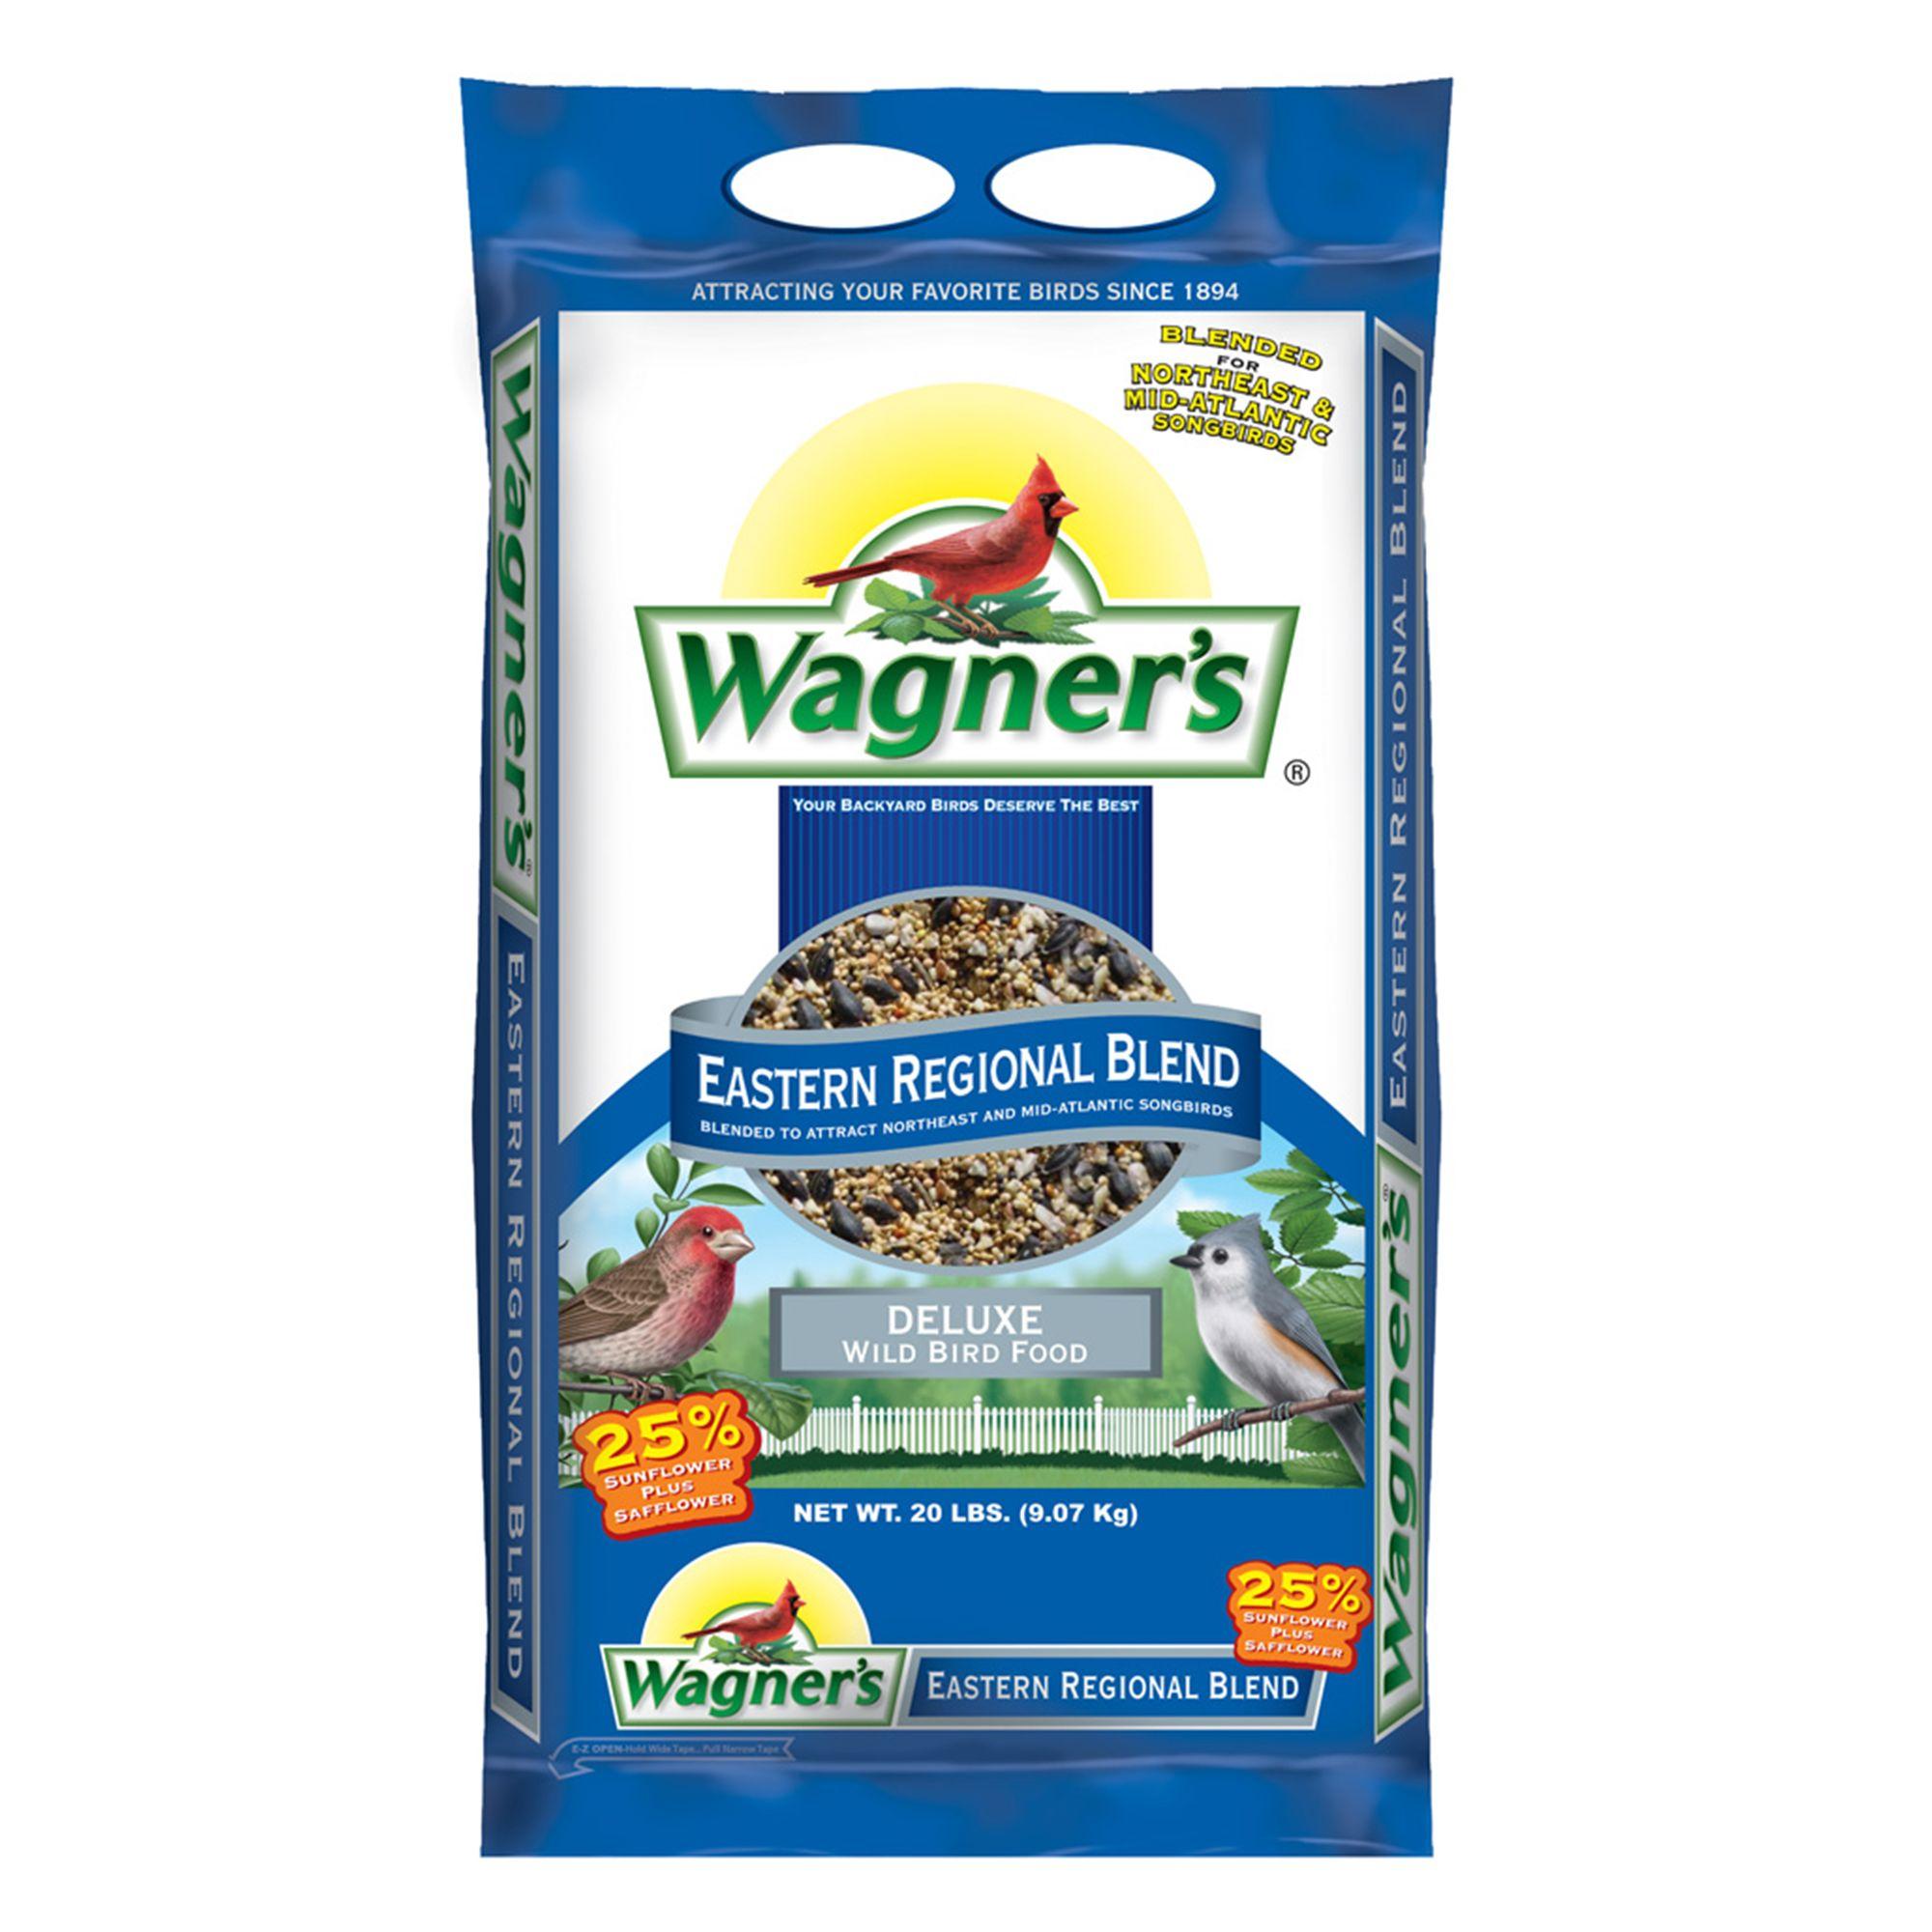 Wagner's Eastern Regional Blend Wild Bird Seed size: 20 Lb, Wagners, Grain, Grain Products 5271541